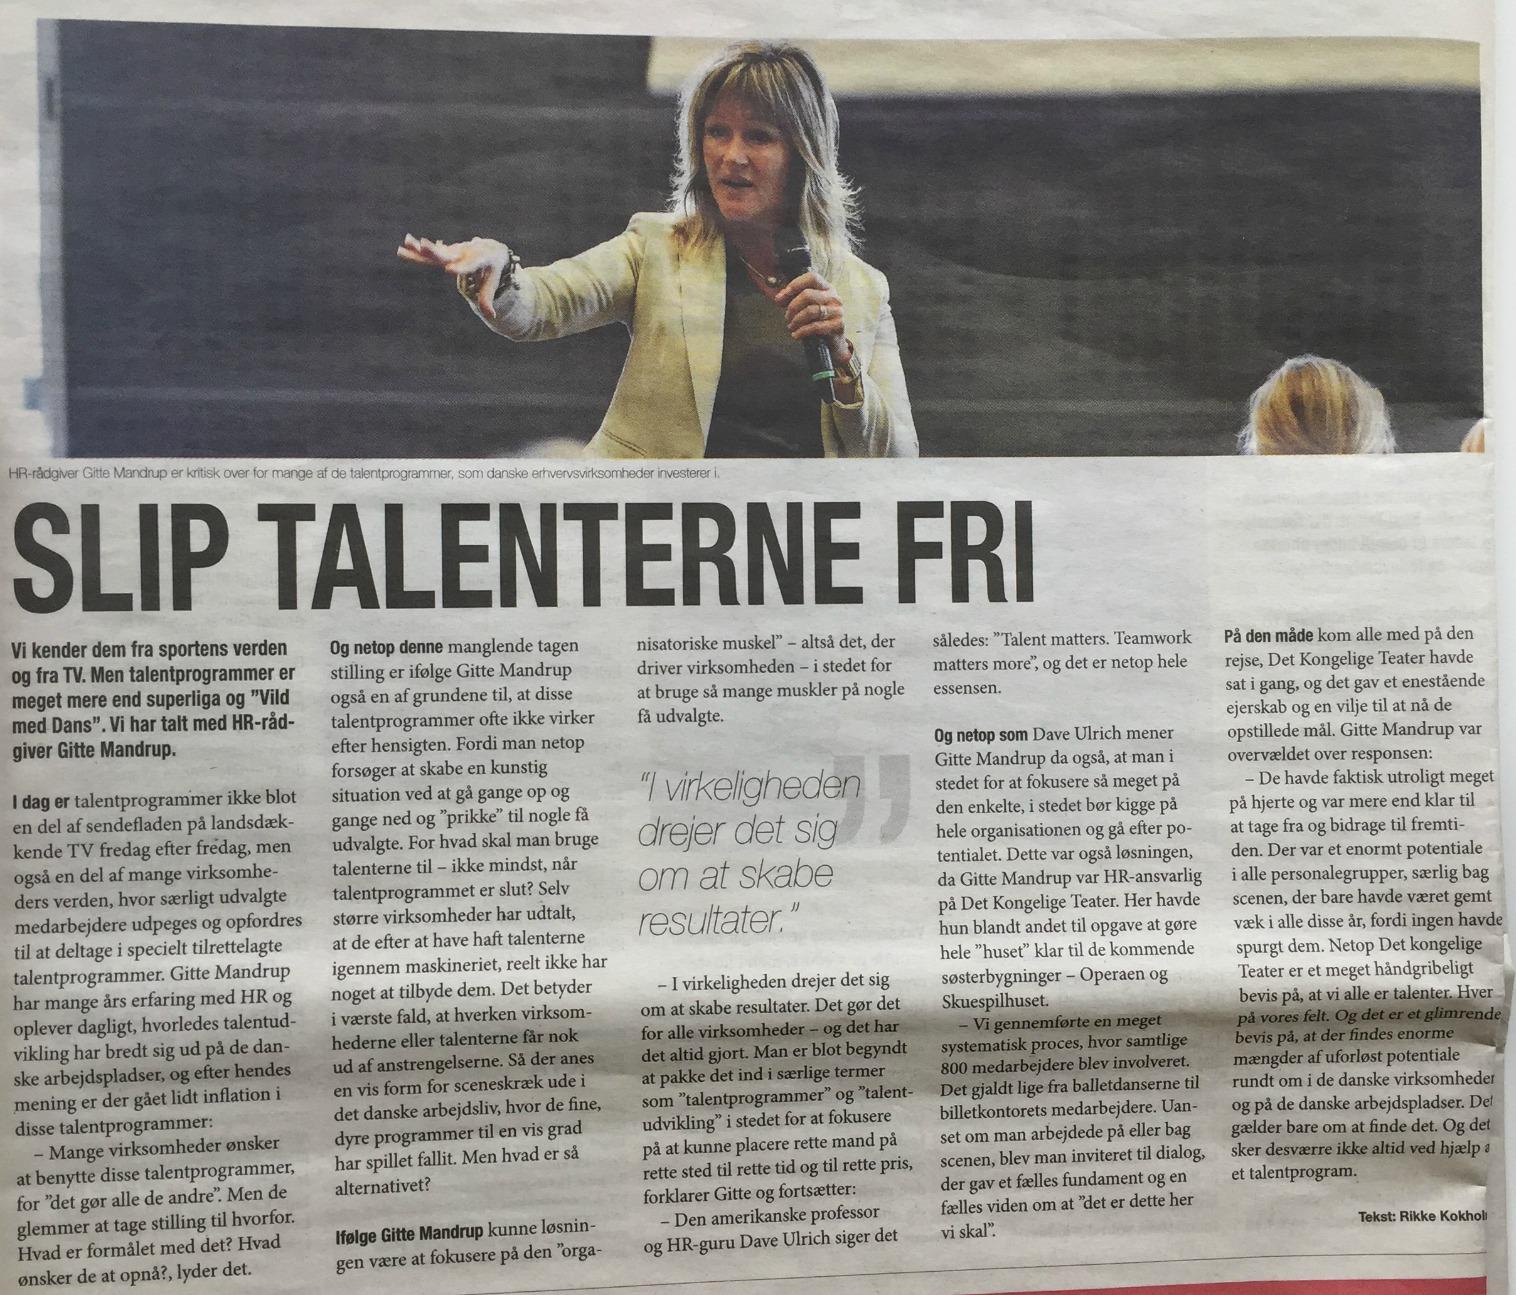 Talentprogram Slip talenterne fri Berlingske 22 okt 2015 @ Gitte Mandrup